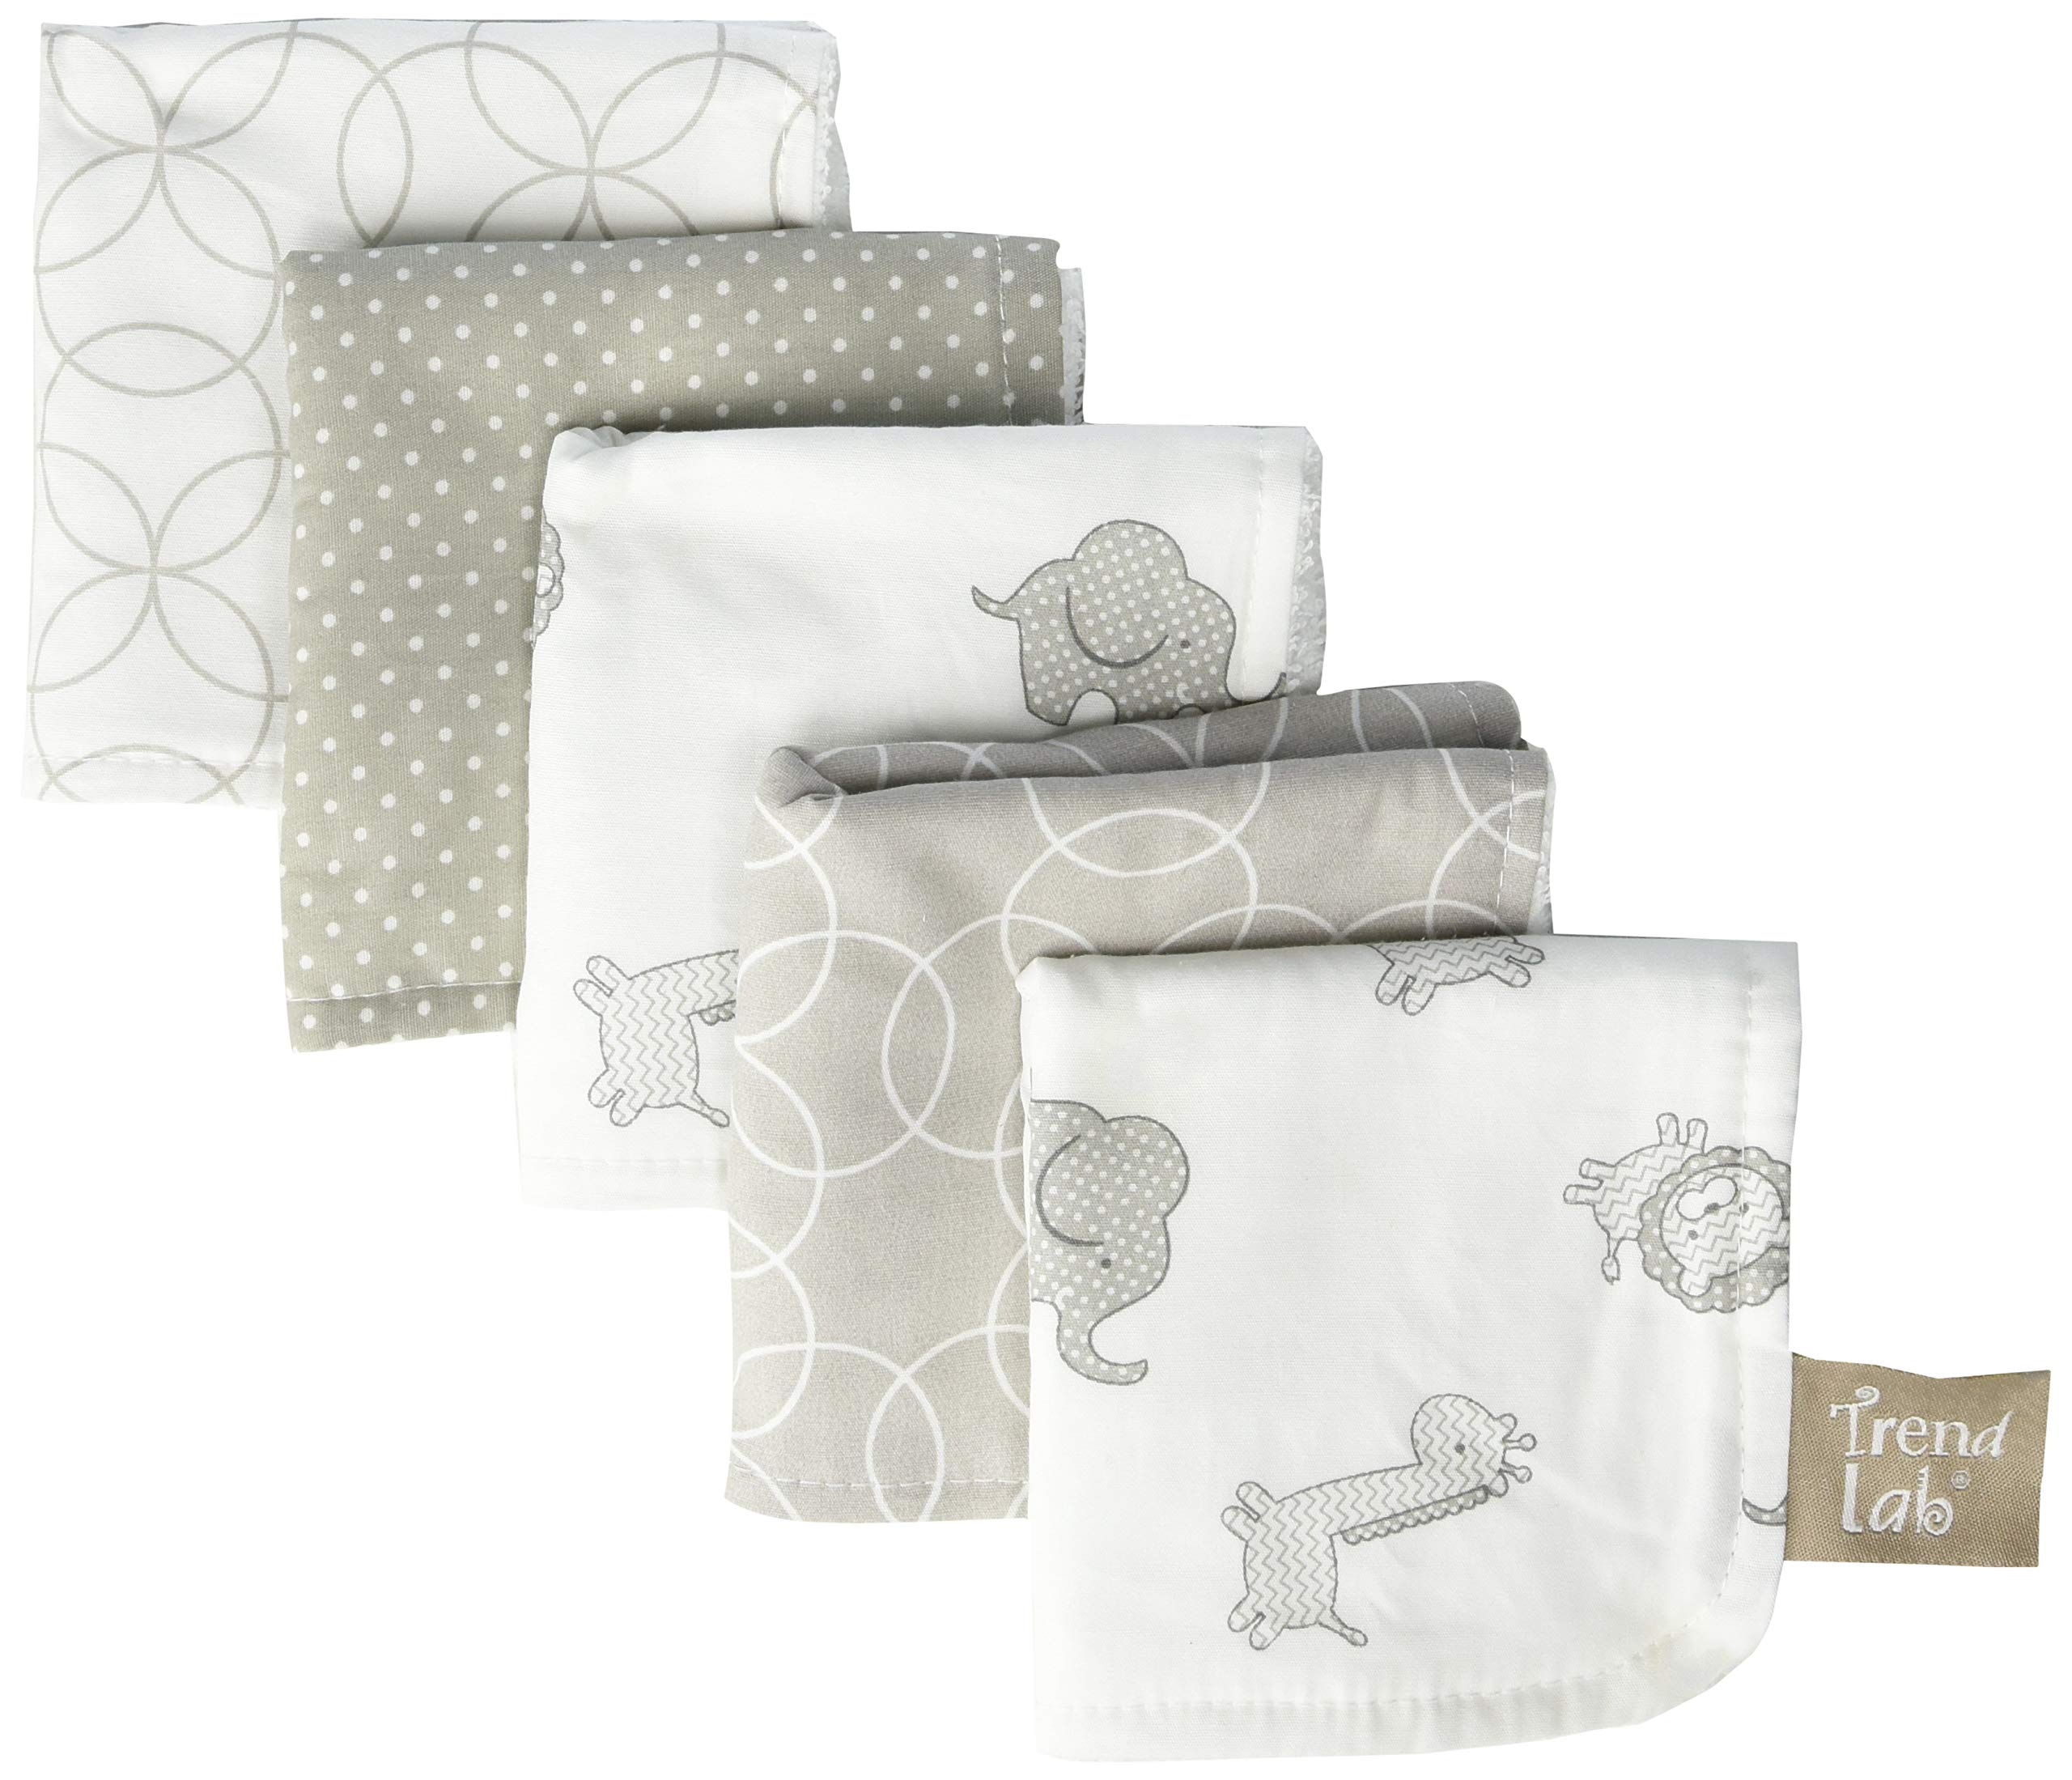 Trend Lab Safari Chevron 6Piece Hooded Towel & Wash Cloth Set by Trend Lab